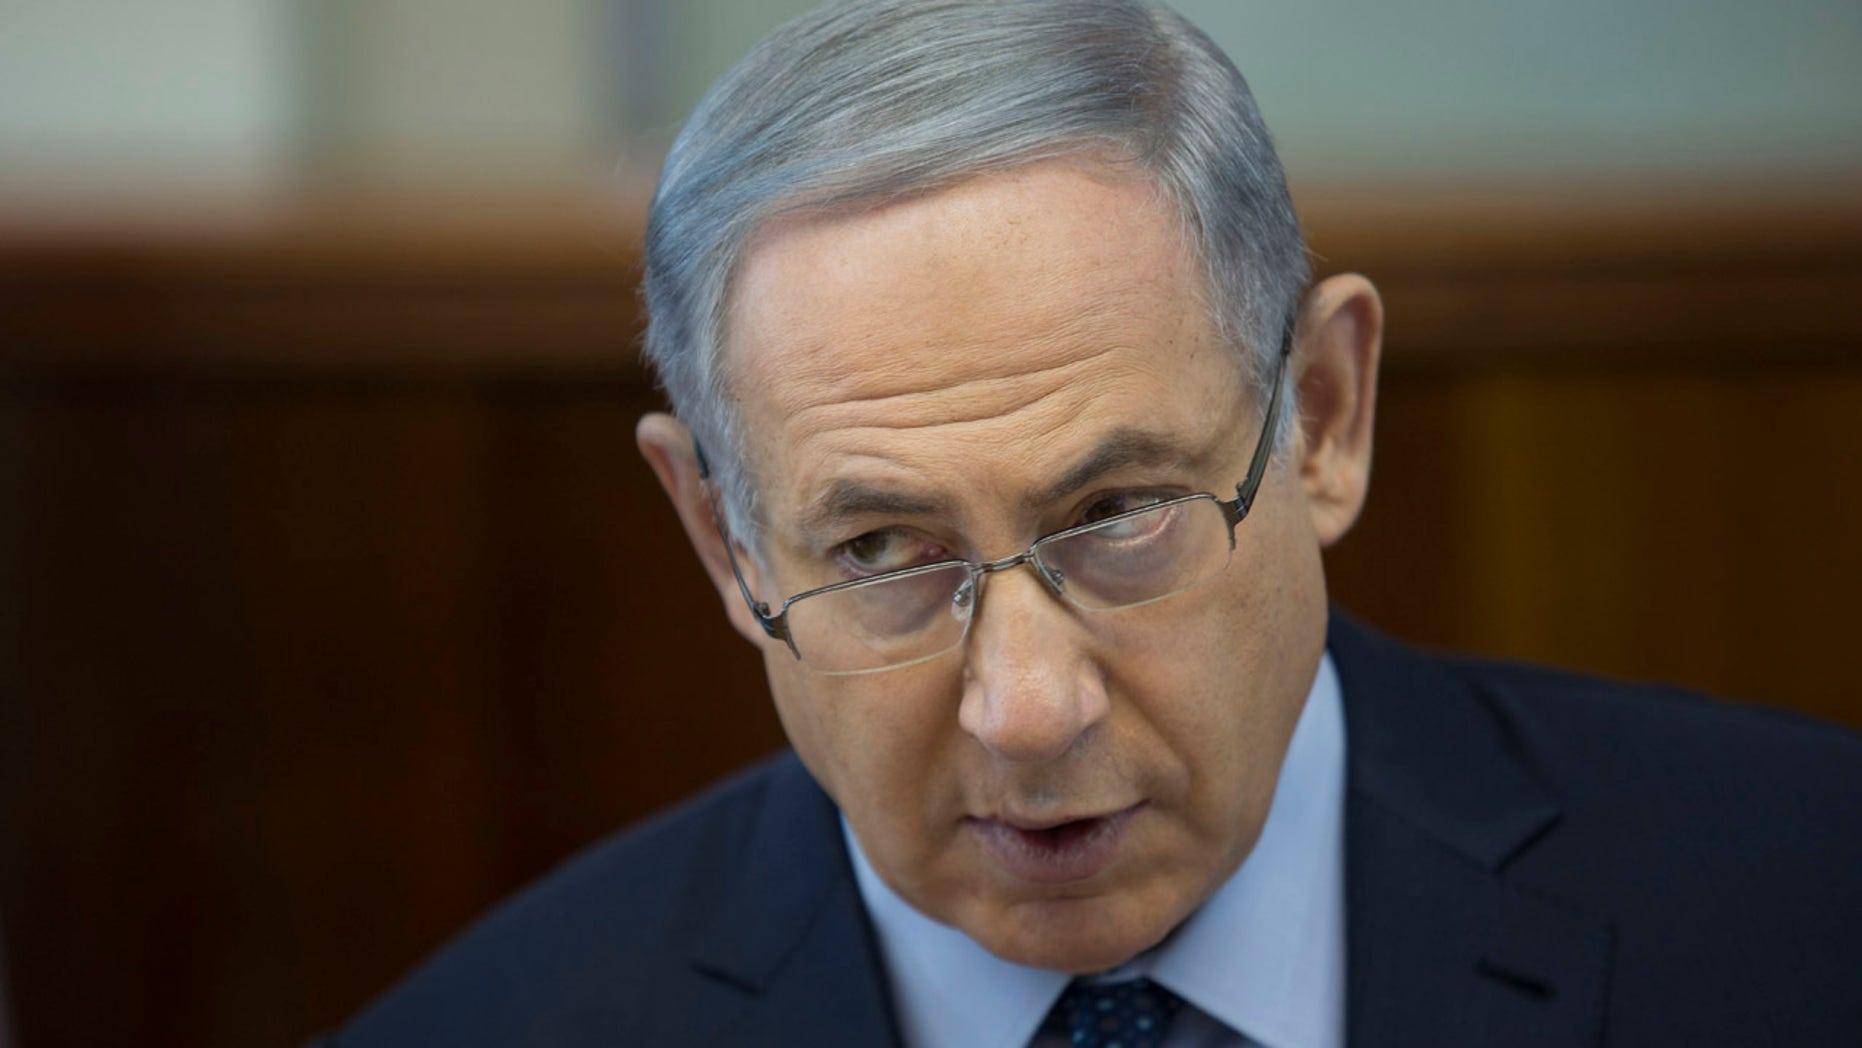 March 6, 2016: Israel's Prime Minister Benjamin Netanyahu chairs the weekly cabinet meeting in Jerusalem. (Abir Sultan/Pool Photo via AP)